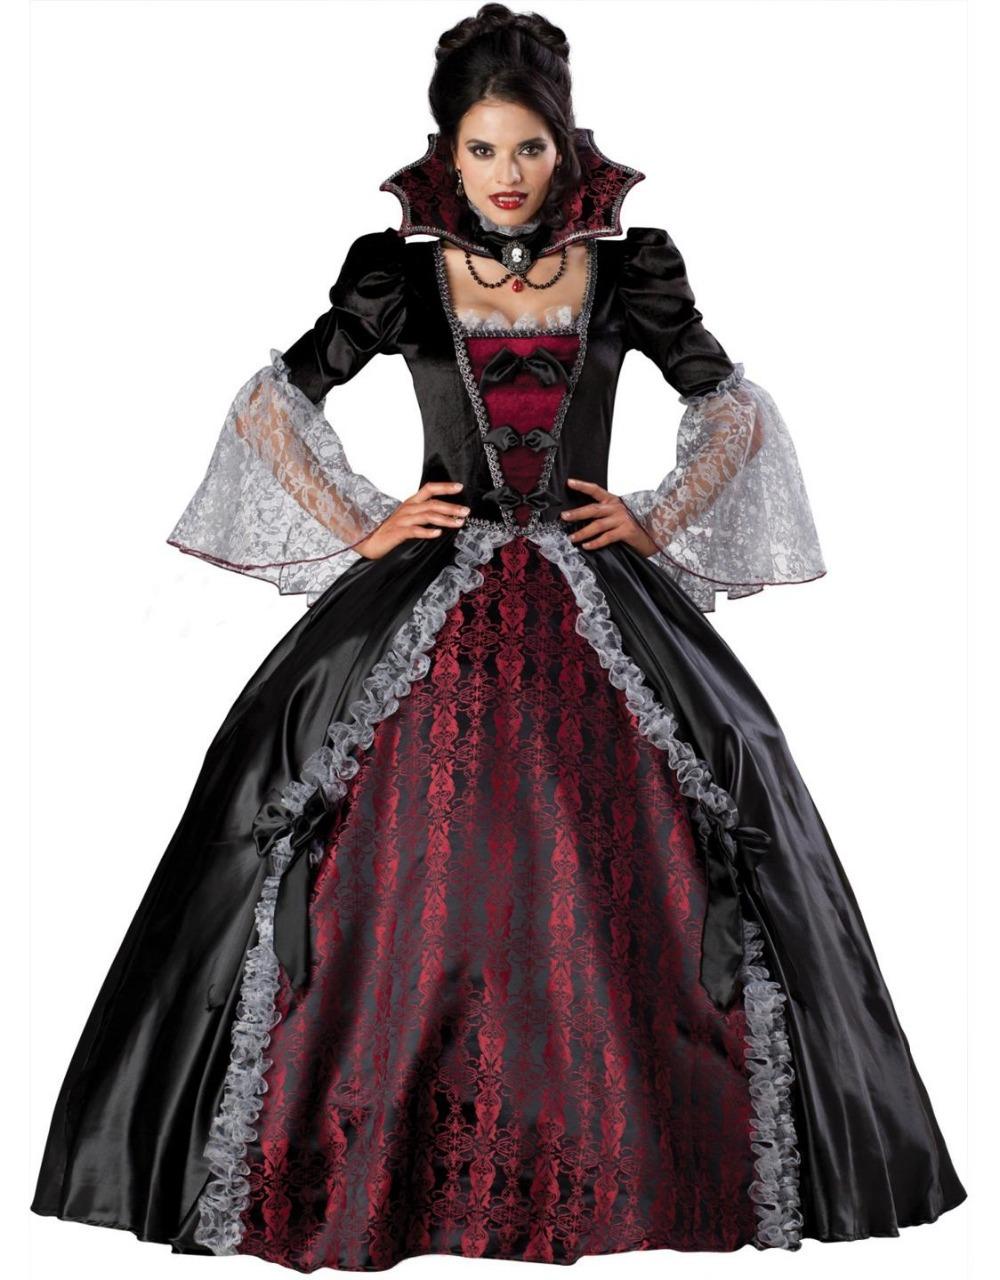 M, L, XL Sexy Women Halloween Costume Black Devil Fantasy Vampire Cosplay Costume W158817(China (Mainland))